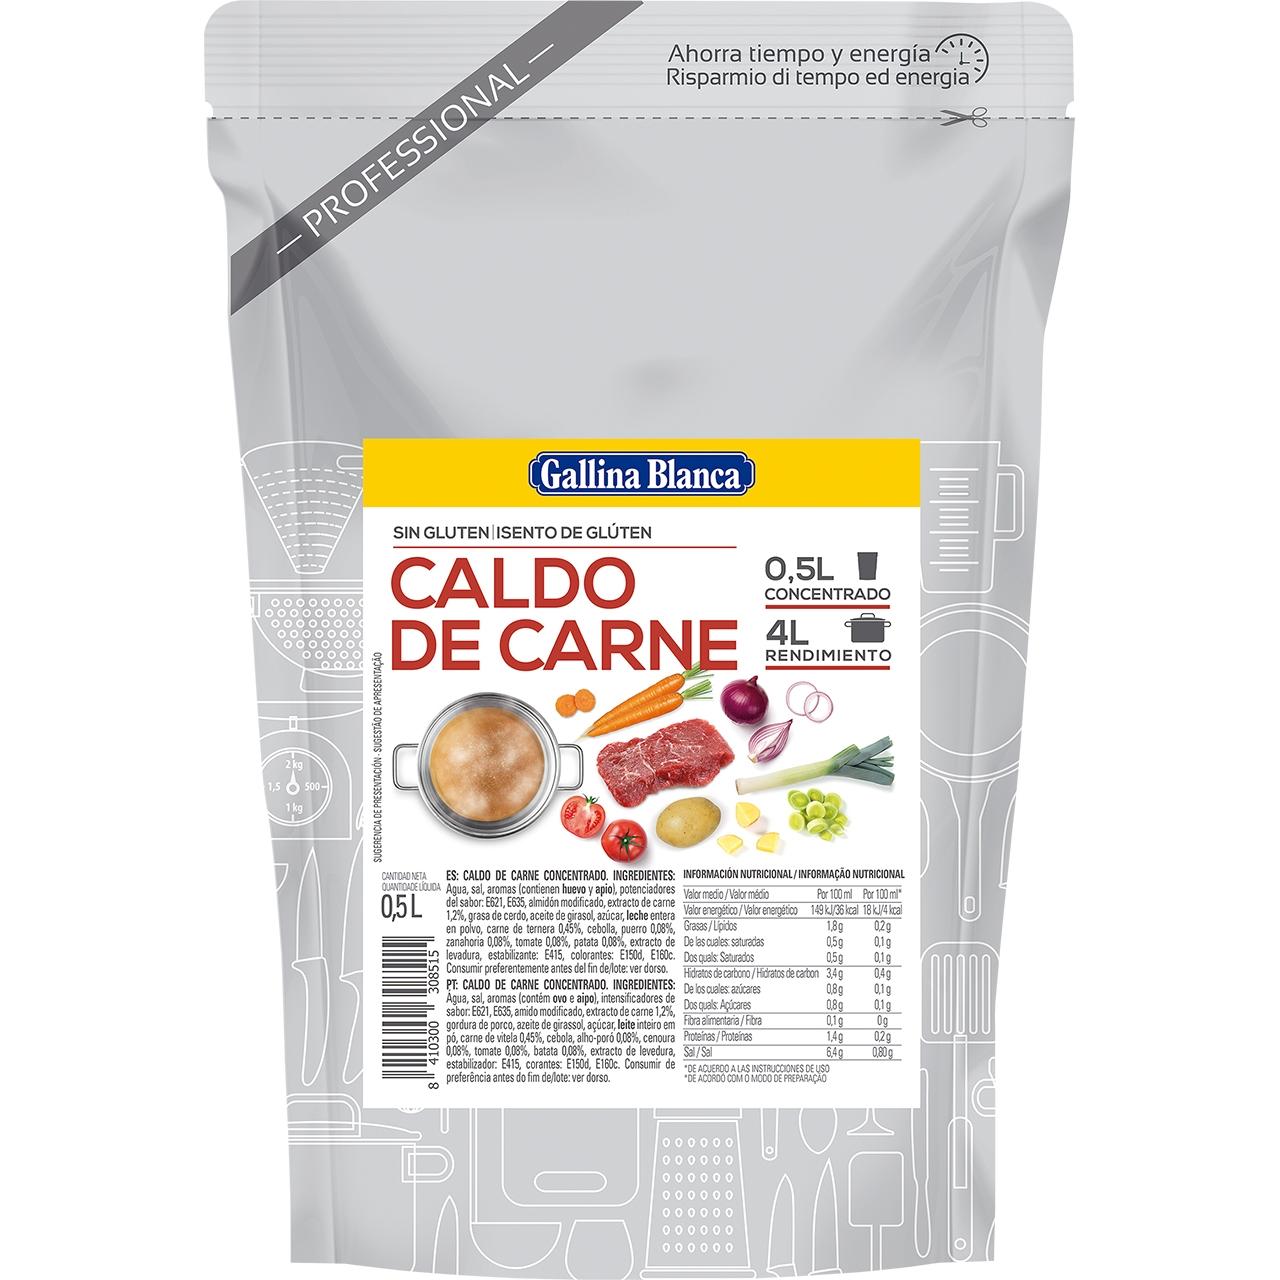 Brou concentrat de carn 0,5l. Gallina Blanca